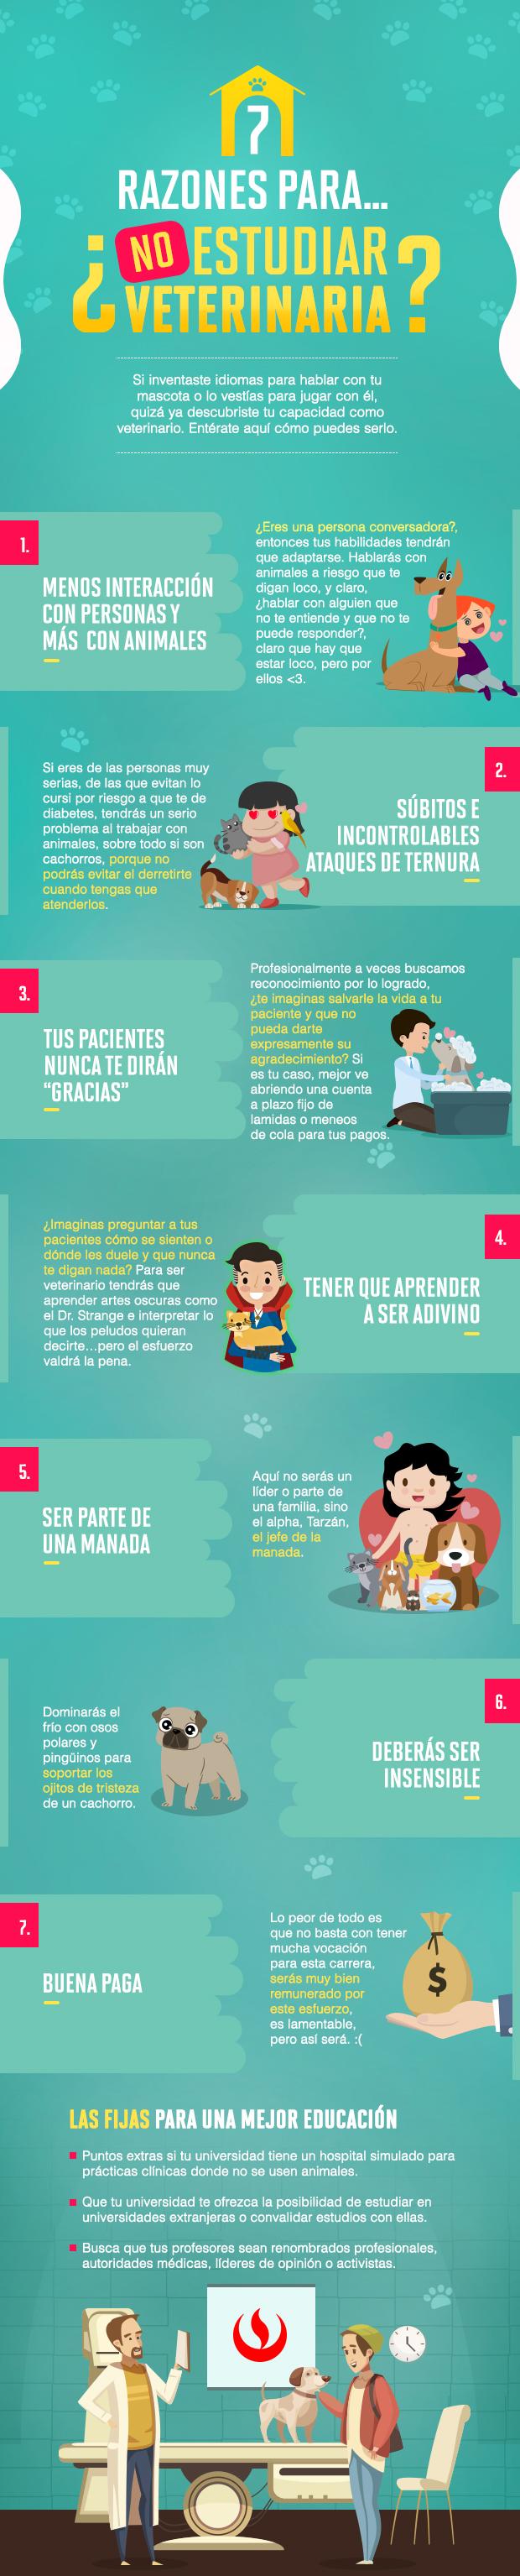 7 razones para estudiar veterinaria